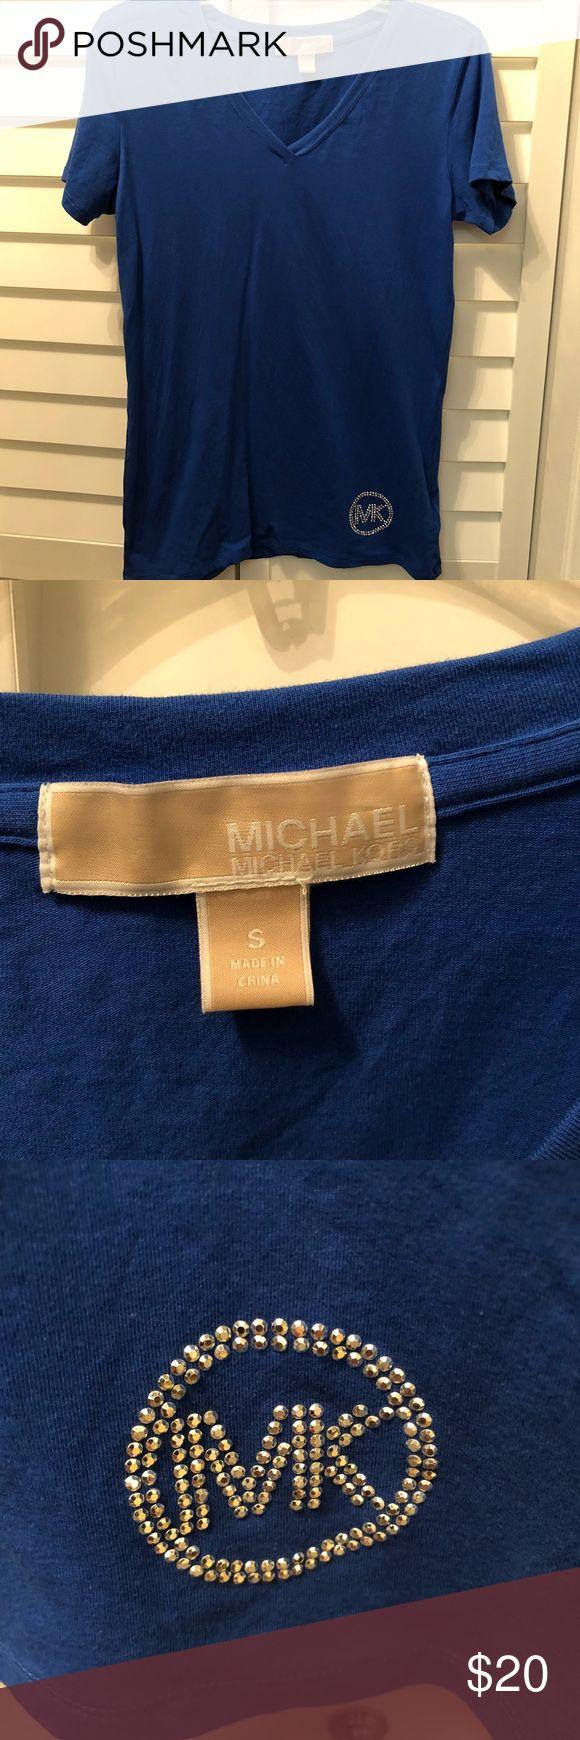 Michael Kors women's T-shirt Michael Kors women's T-shirt  Great Condition only worn once Michael Kors Tops Tees - Short Sleeve